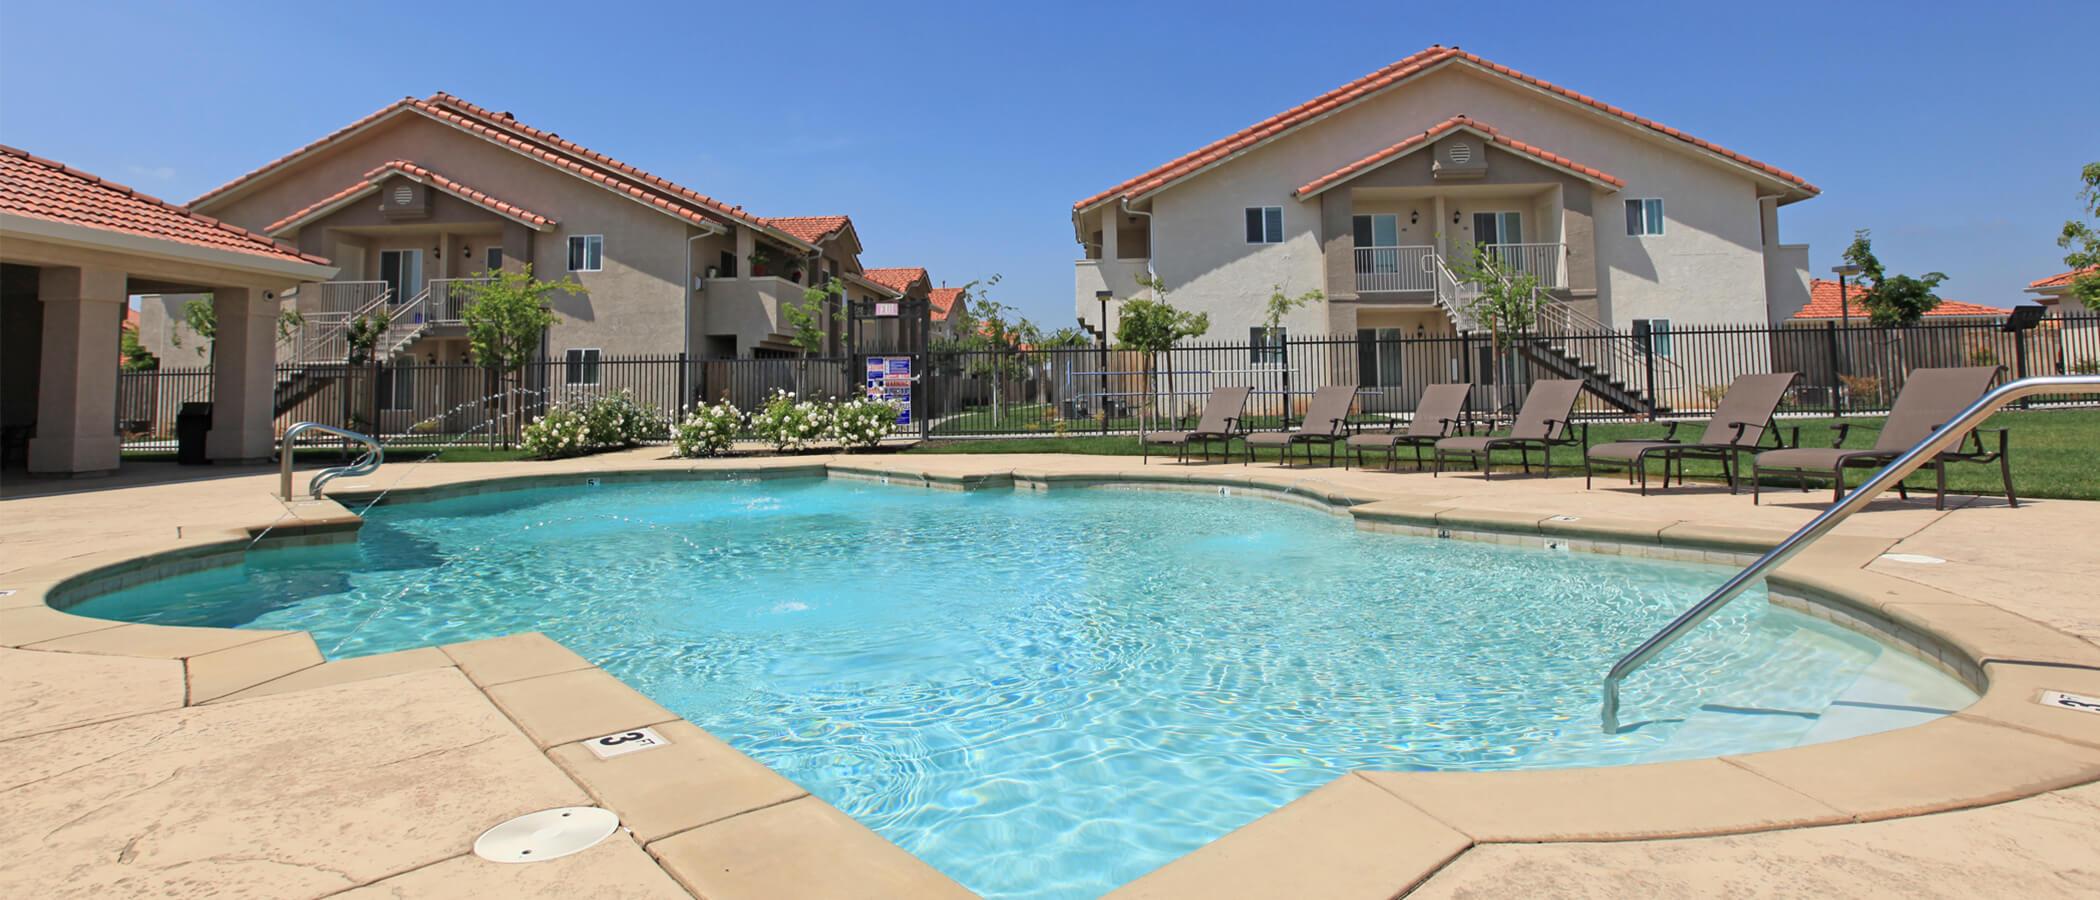 Chestnut Court Apartment Homes In Fresno Ca